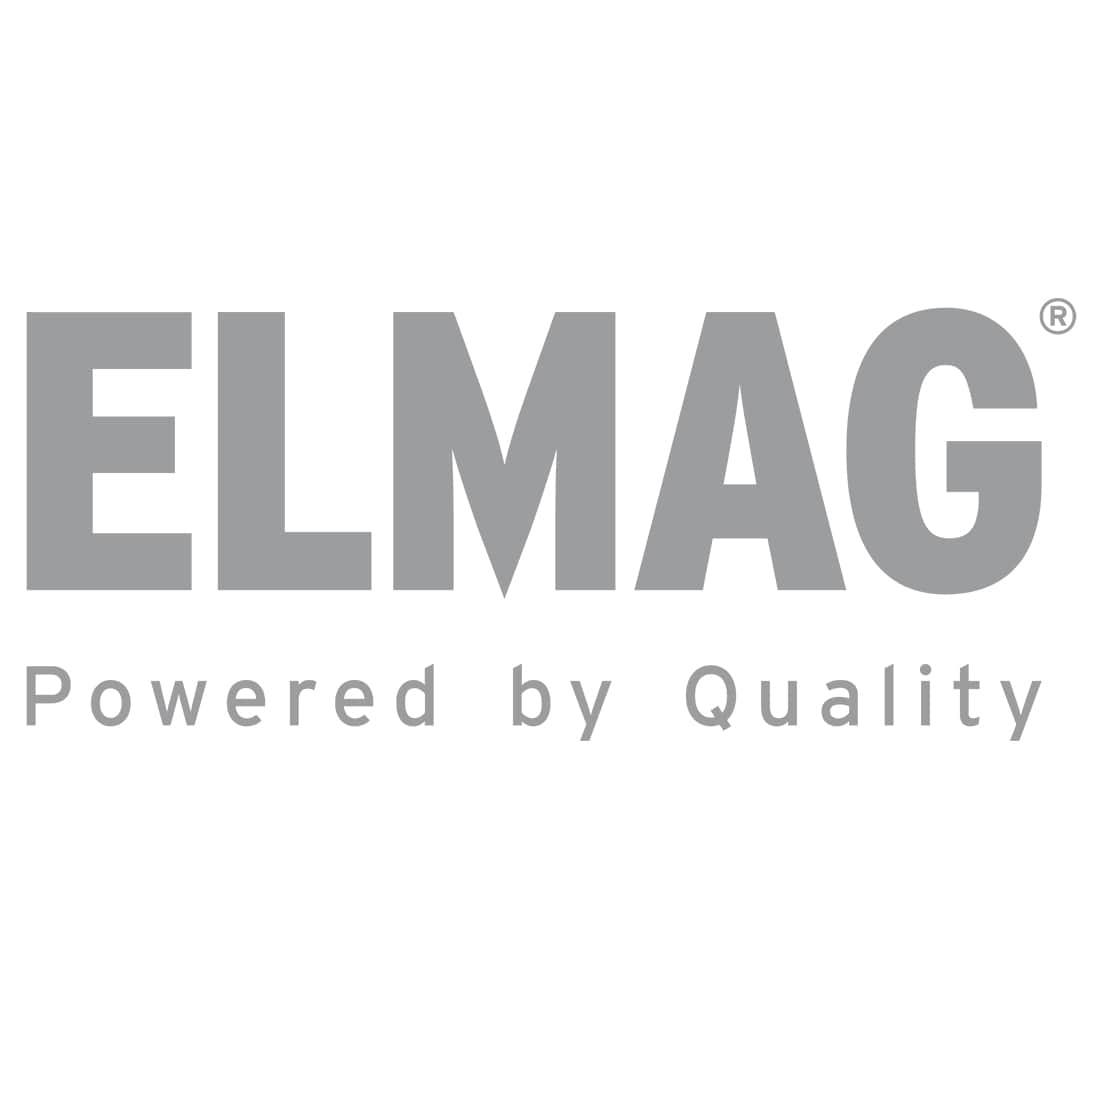 Flange pair complete item 68-71, 201